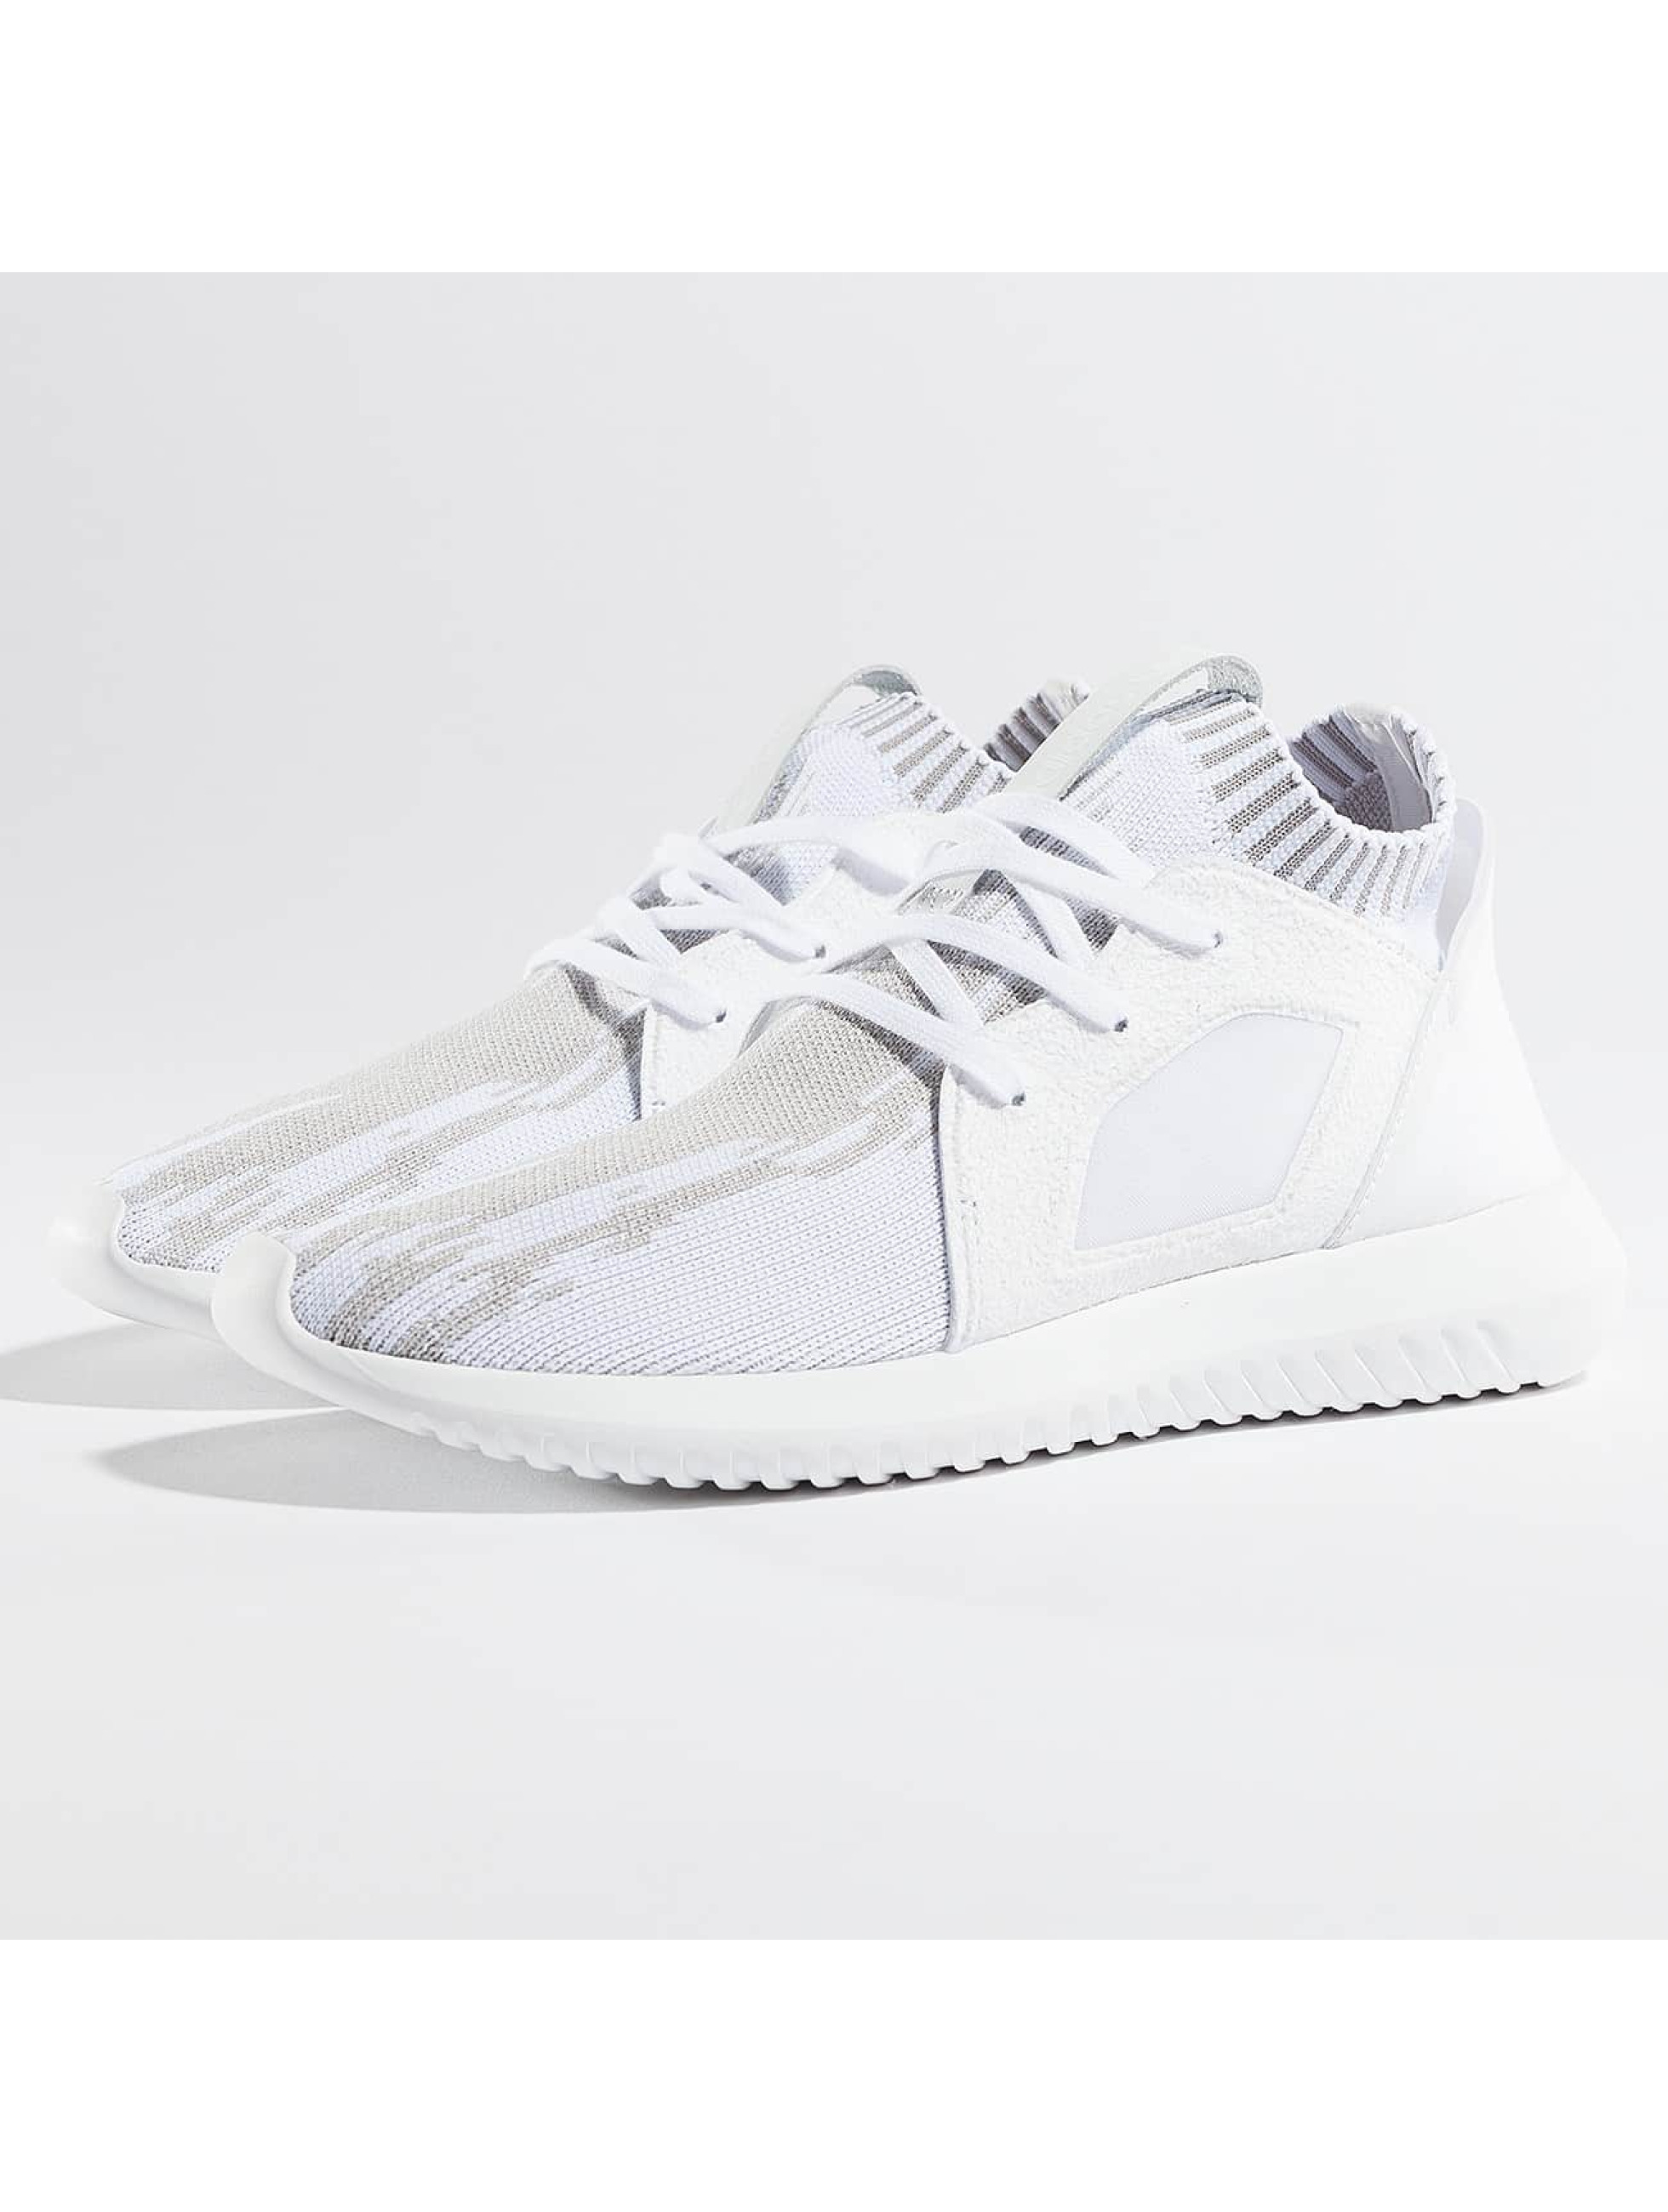 adidas originals Donne Scarpe / Sneaker Tubular Defiant PK W bianco 317131 40